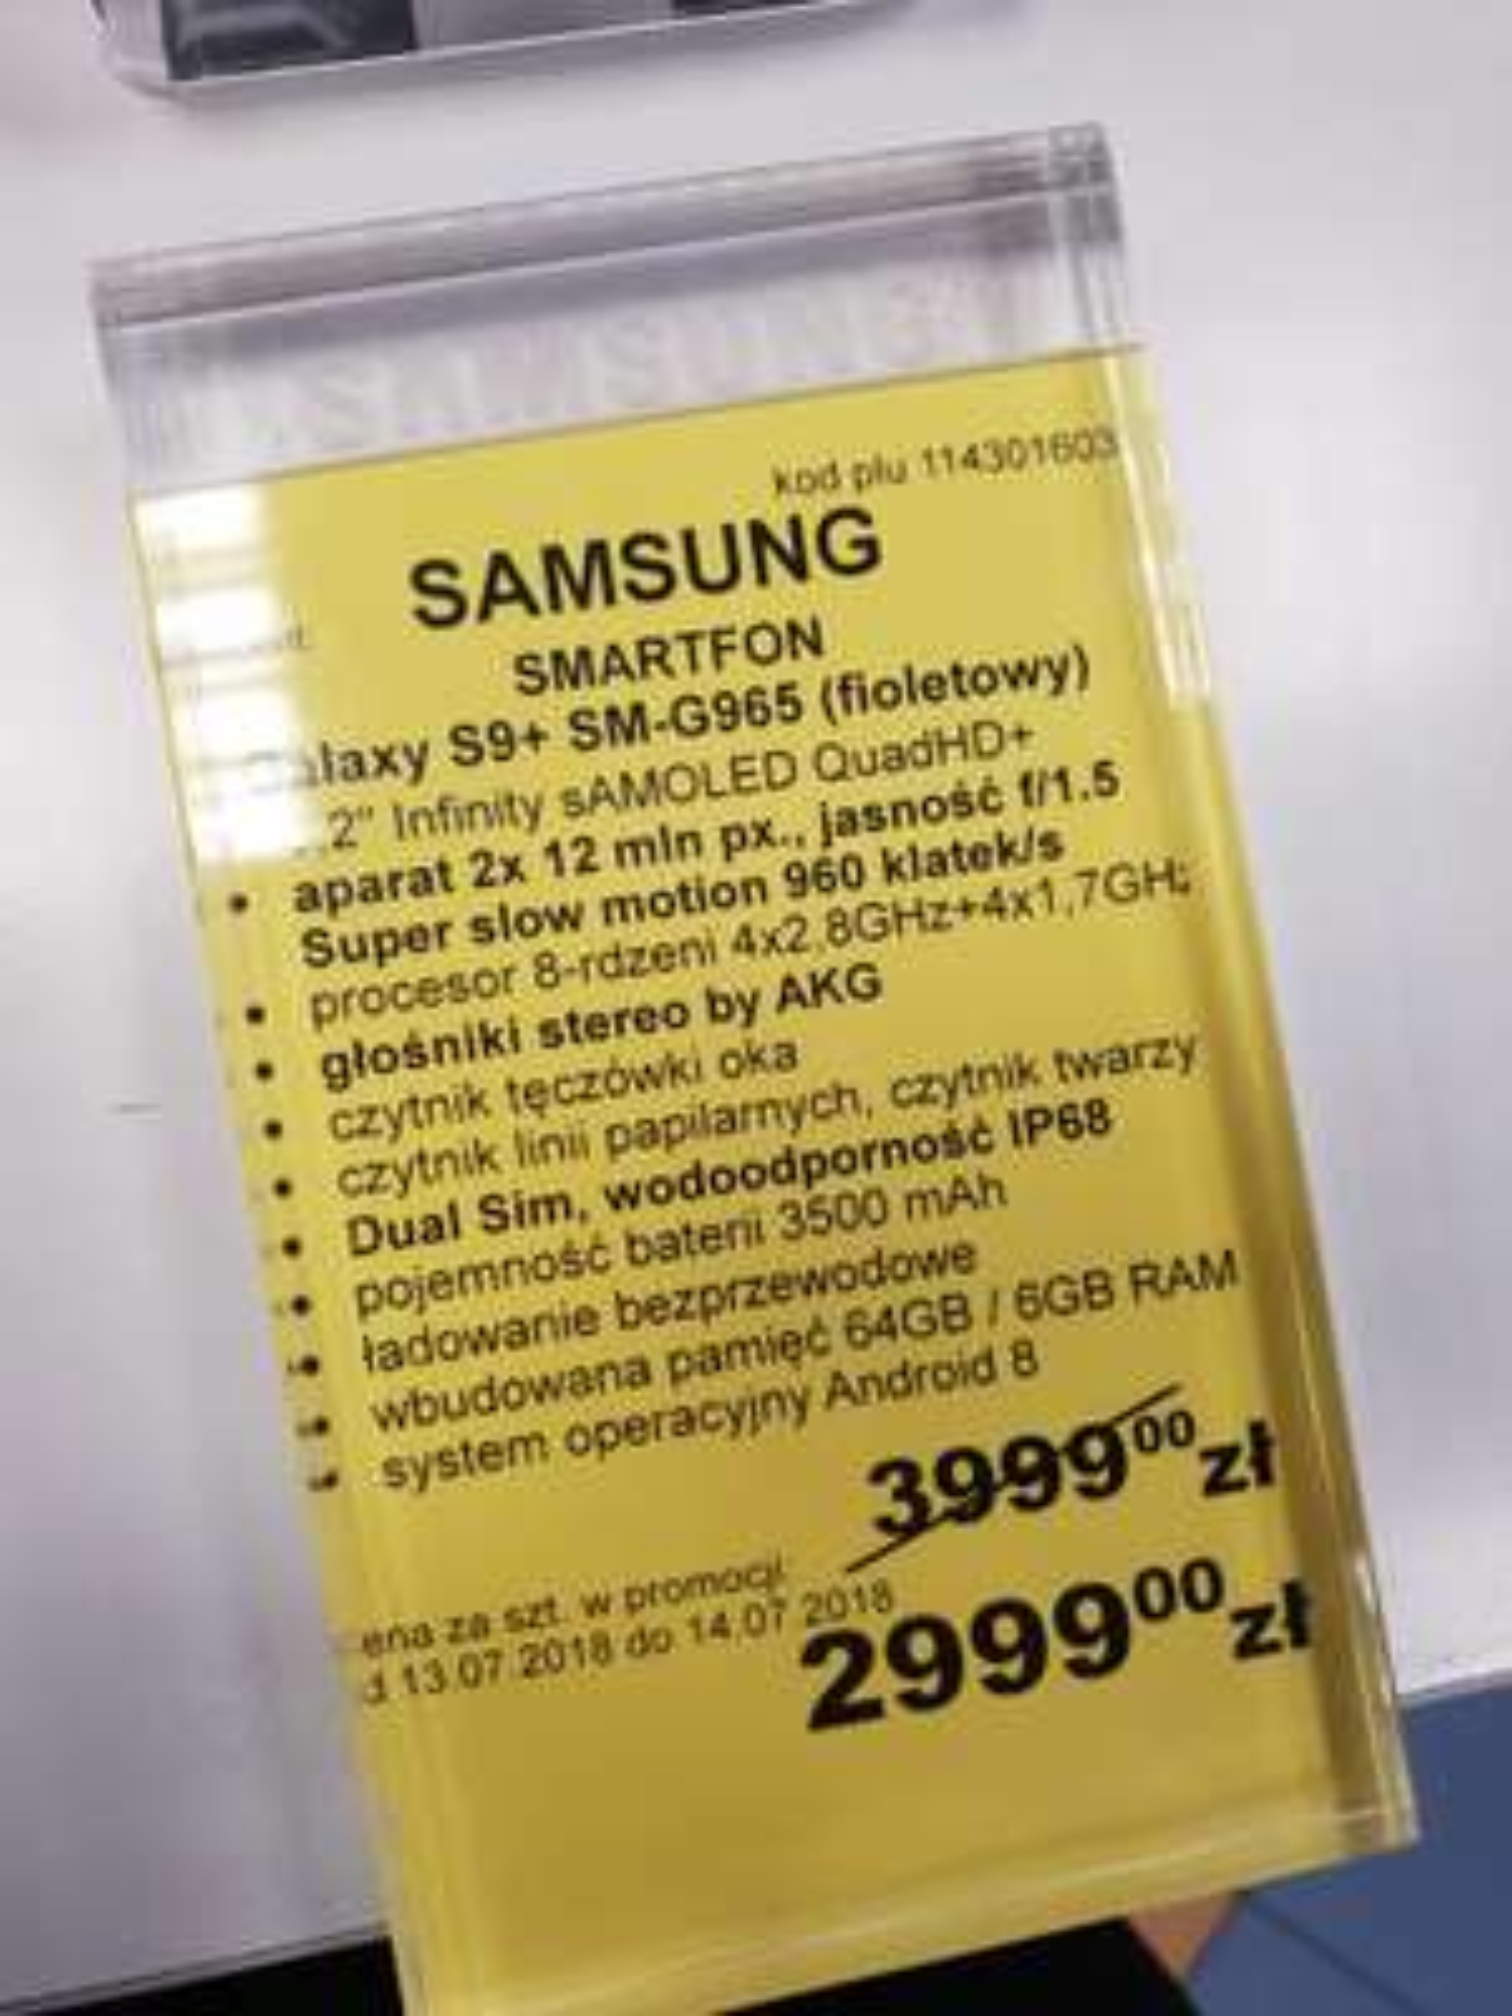 Samsung Galaxy s9+ (możliwe 2299zł) RTV euro AGD